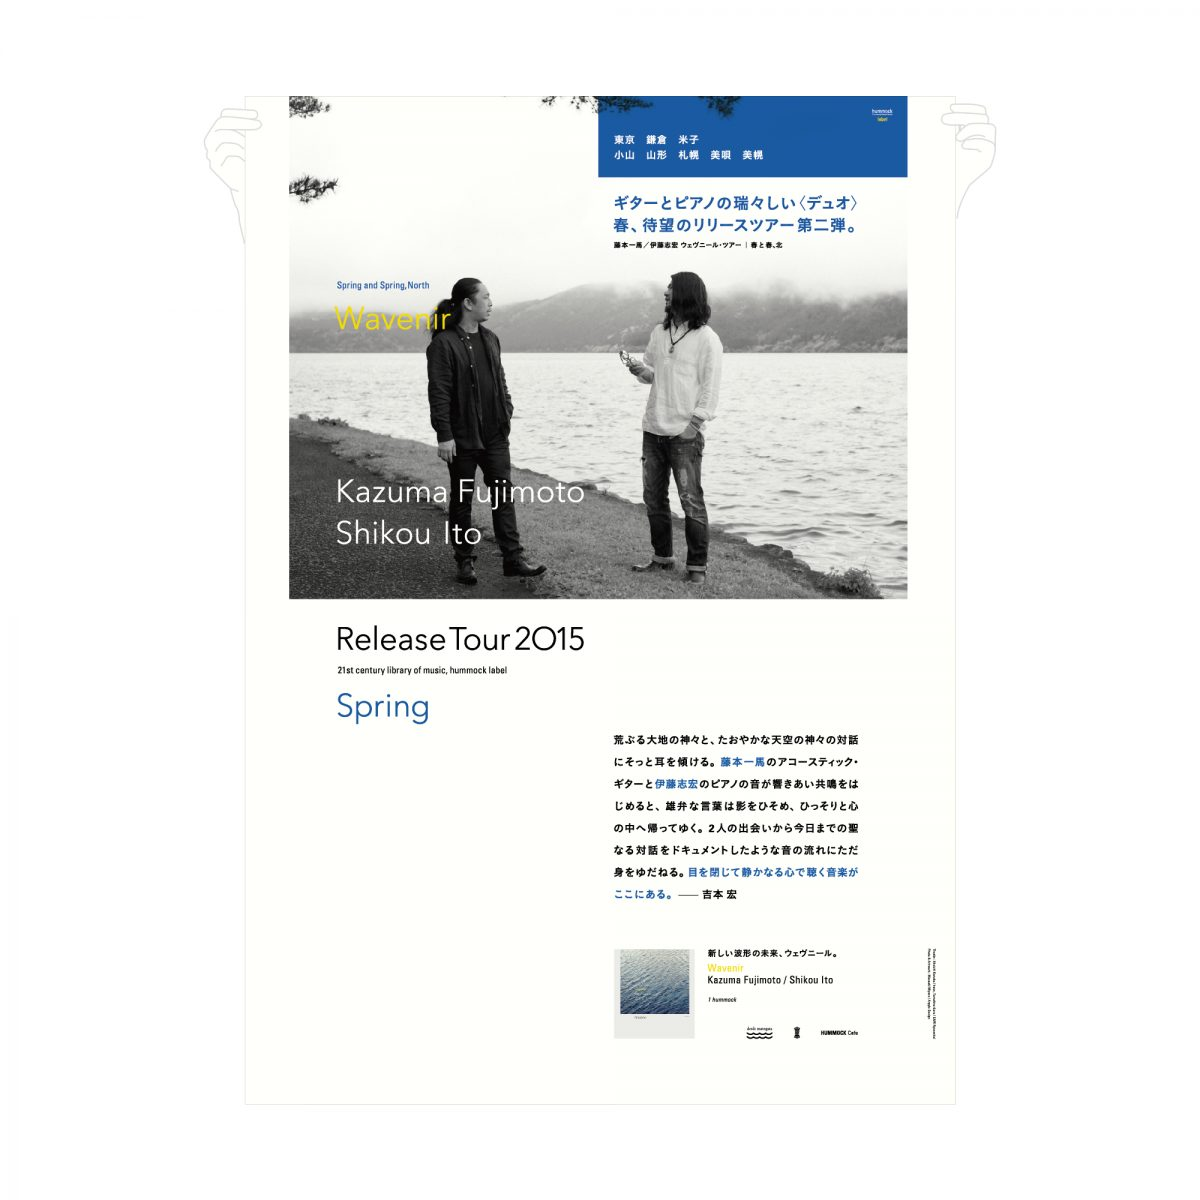 Hummock Label|藤本一馬 / 伊藤志宏 ウェヴニール・ツアー 2015 「春 と 春、北」|パンフレット グラフィックデザイン